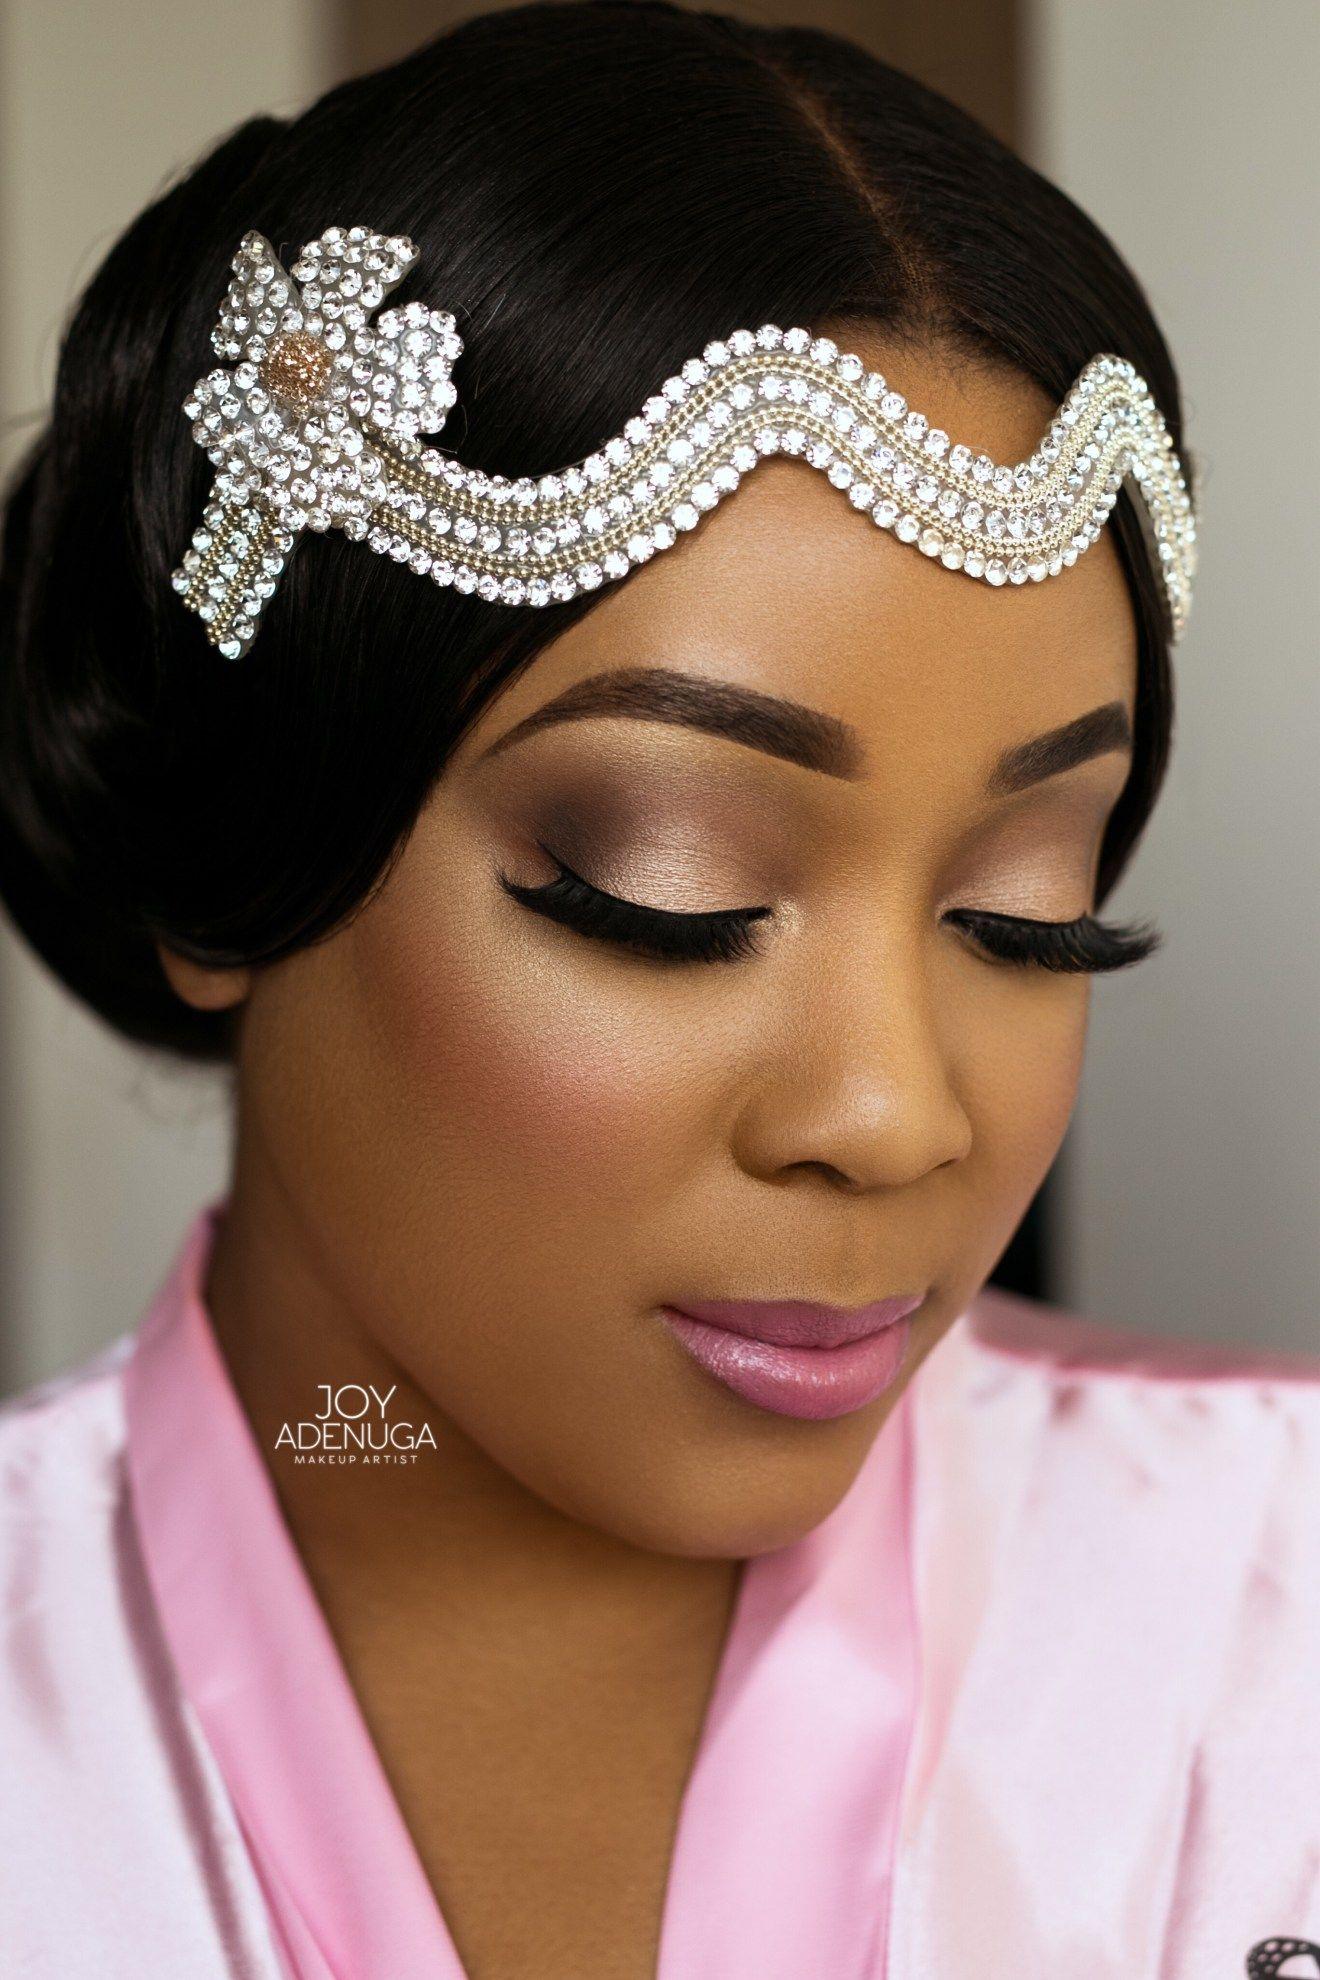 Cherish S Wedding Joy Adenuga Black Bride Bridal Blog London Makeup Artist For Skin